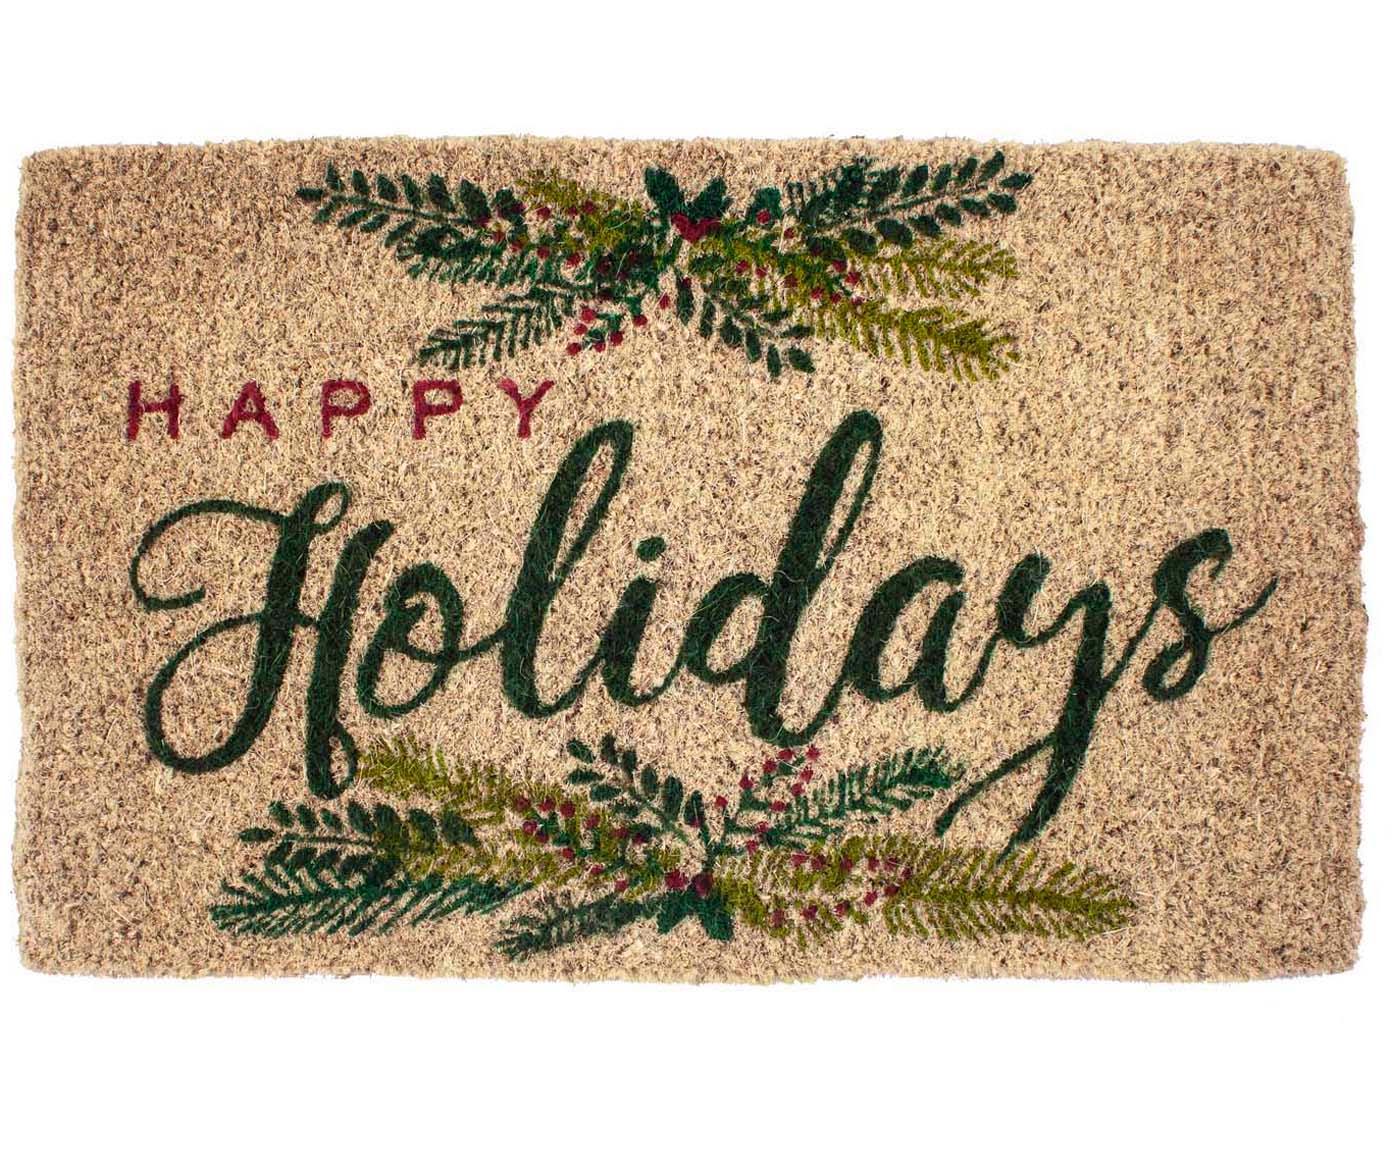 Felpudo artesanal Happy Holidays, Fibras de coco, Beige, verde, rojo, An 43 x L 70 cm